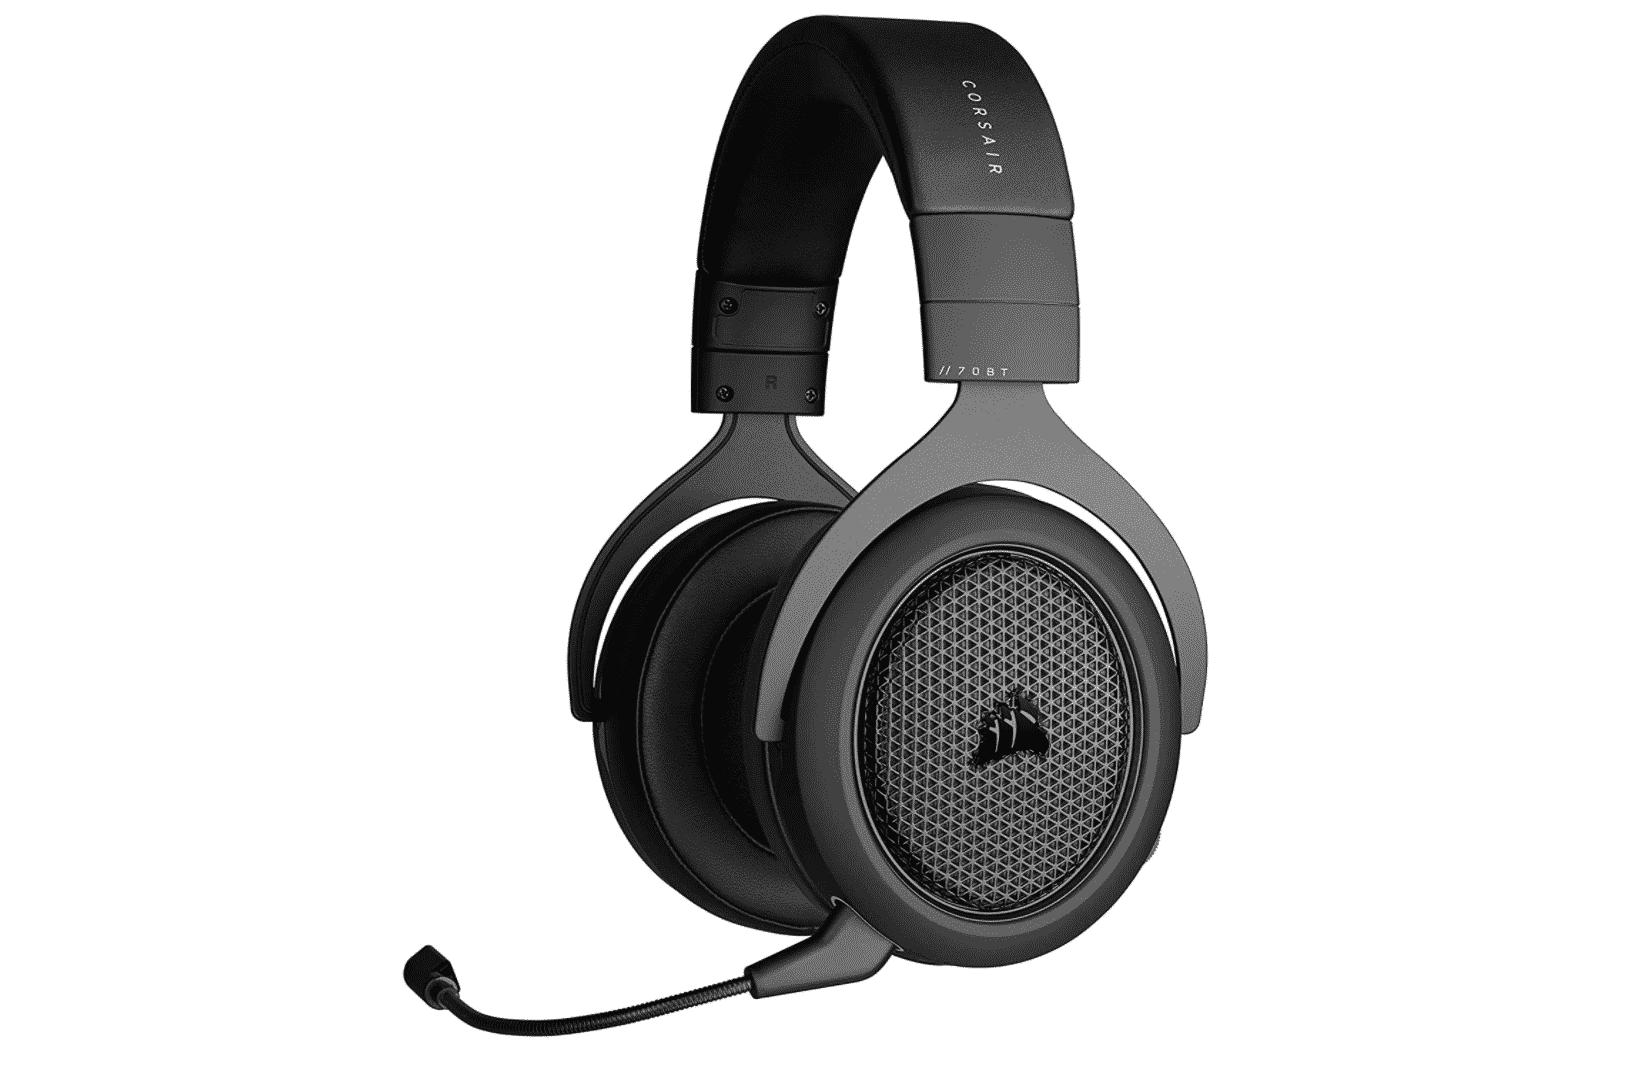 Corsair HS70 Bluetooth Headset